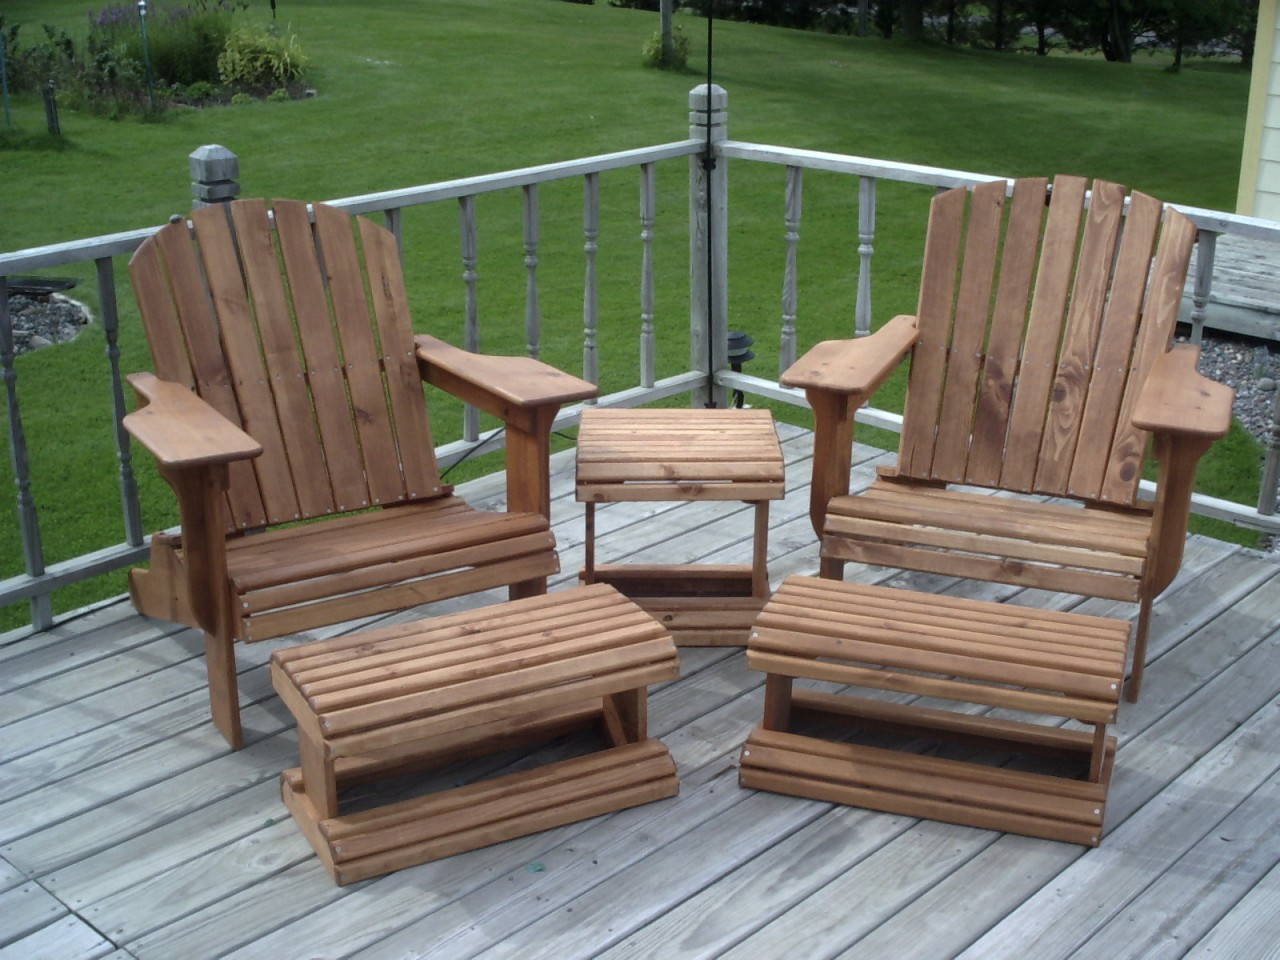 Adirondack chair ottoman woodworking plans adirondack chair ottoman woodworking plans solutioingenieria Choice Image